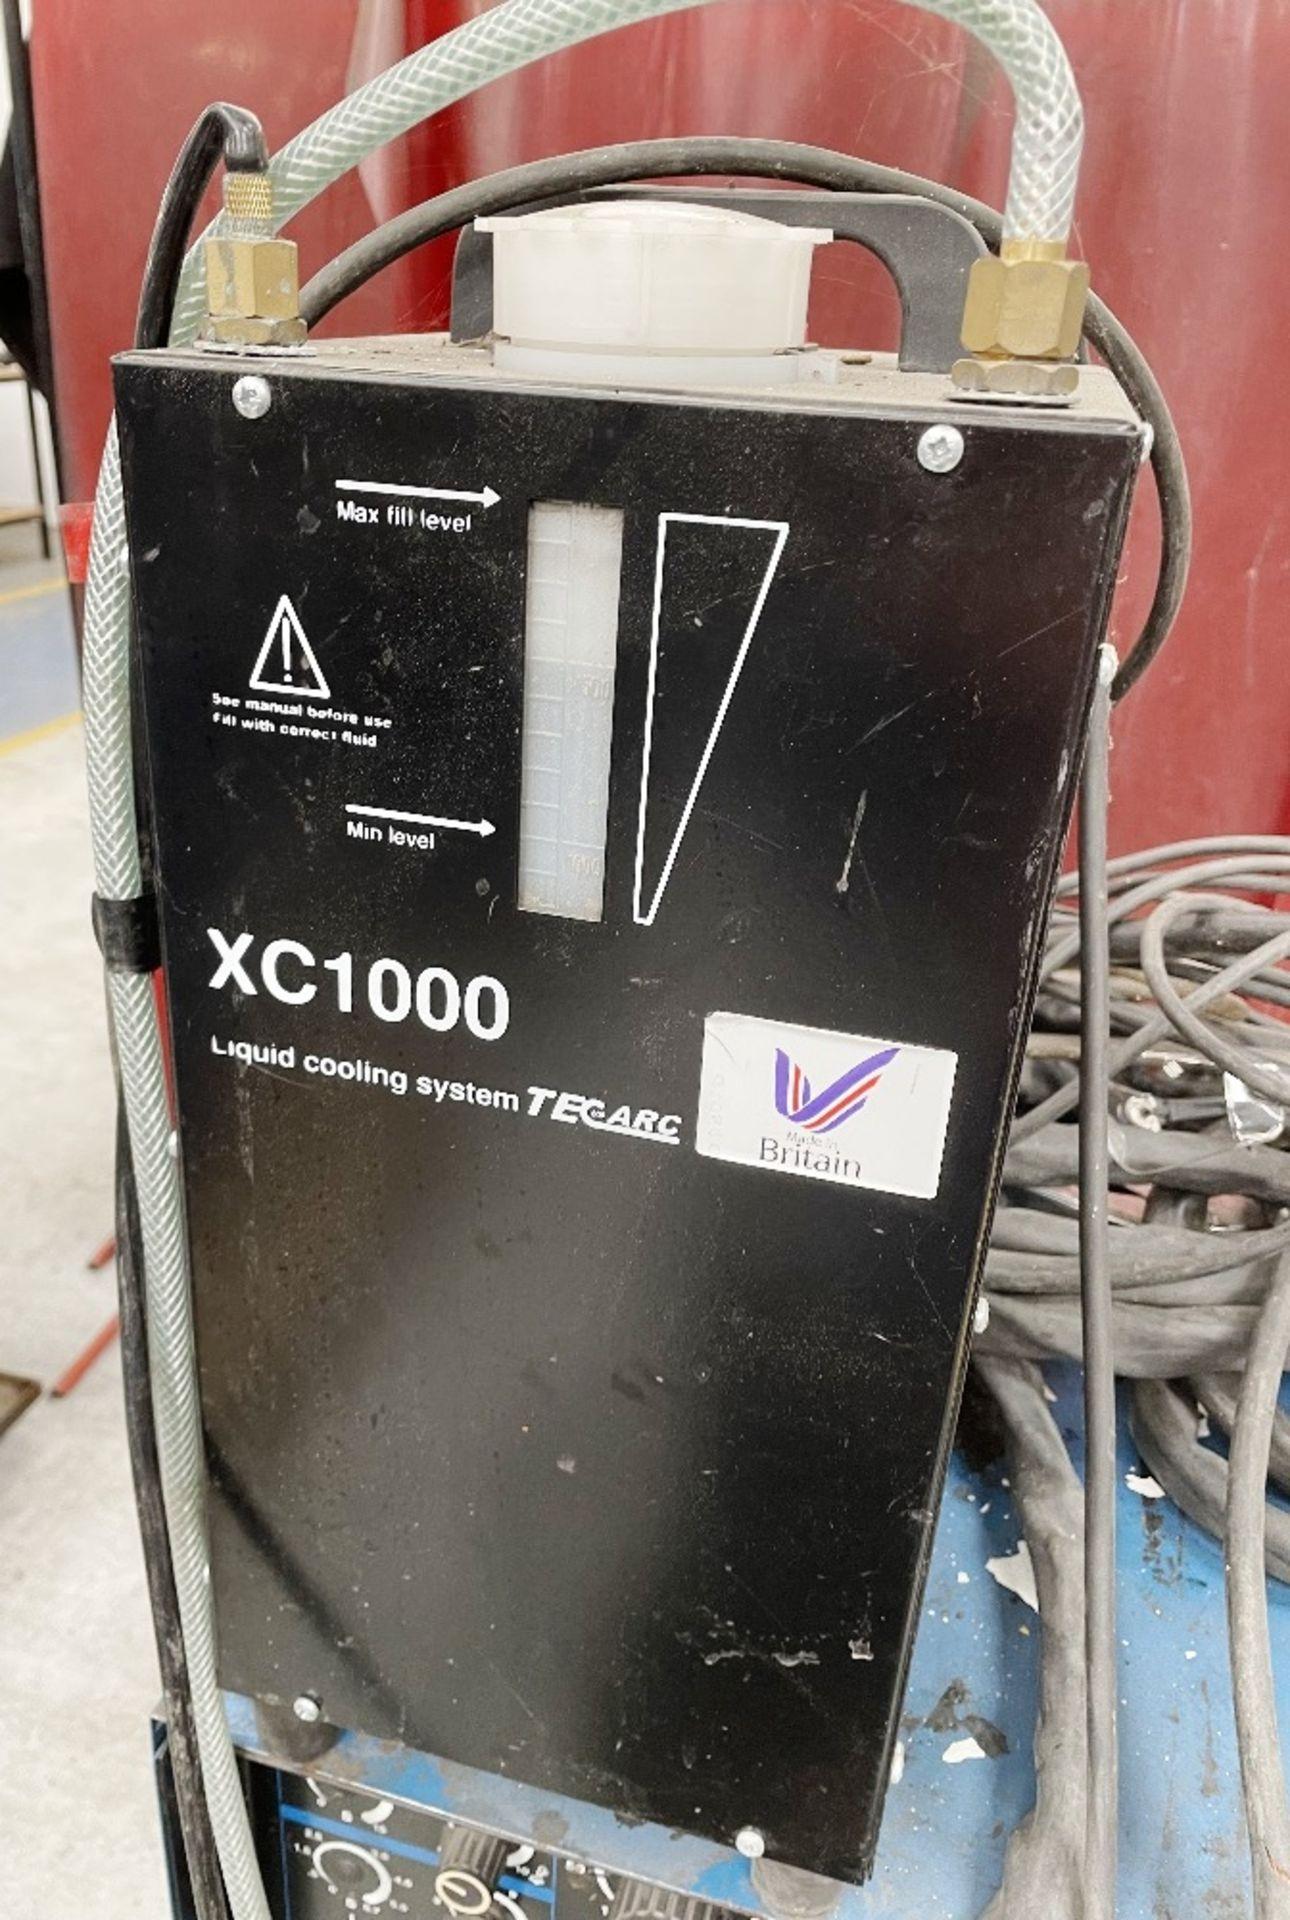 Miller Syncrowave 250 Tig Welder w/ TecArc XC1000 Water Cooler - Image 3 of 5